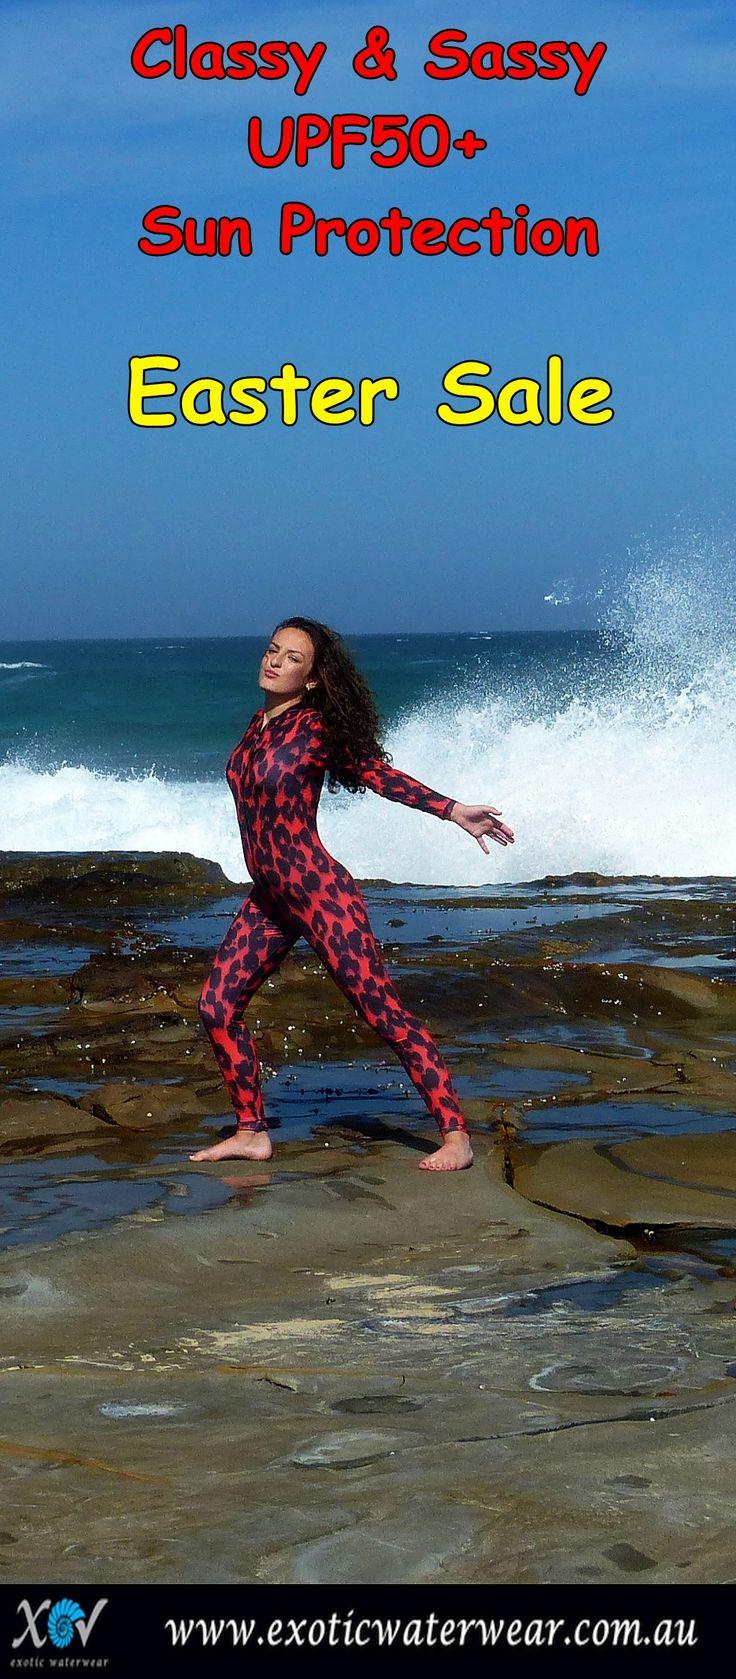 Easter Sale www.exoticwaterwear.com.au  #stingersuit #eastersale